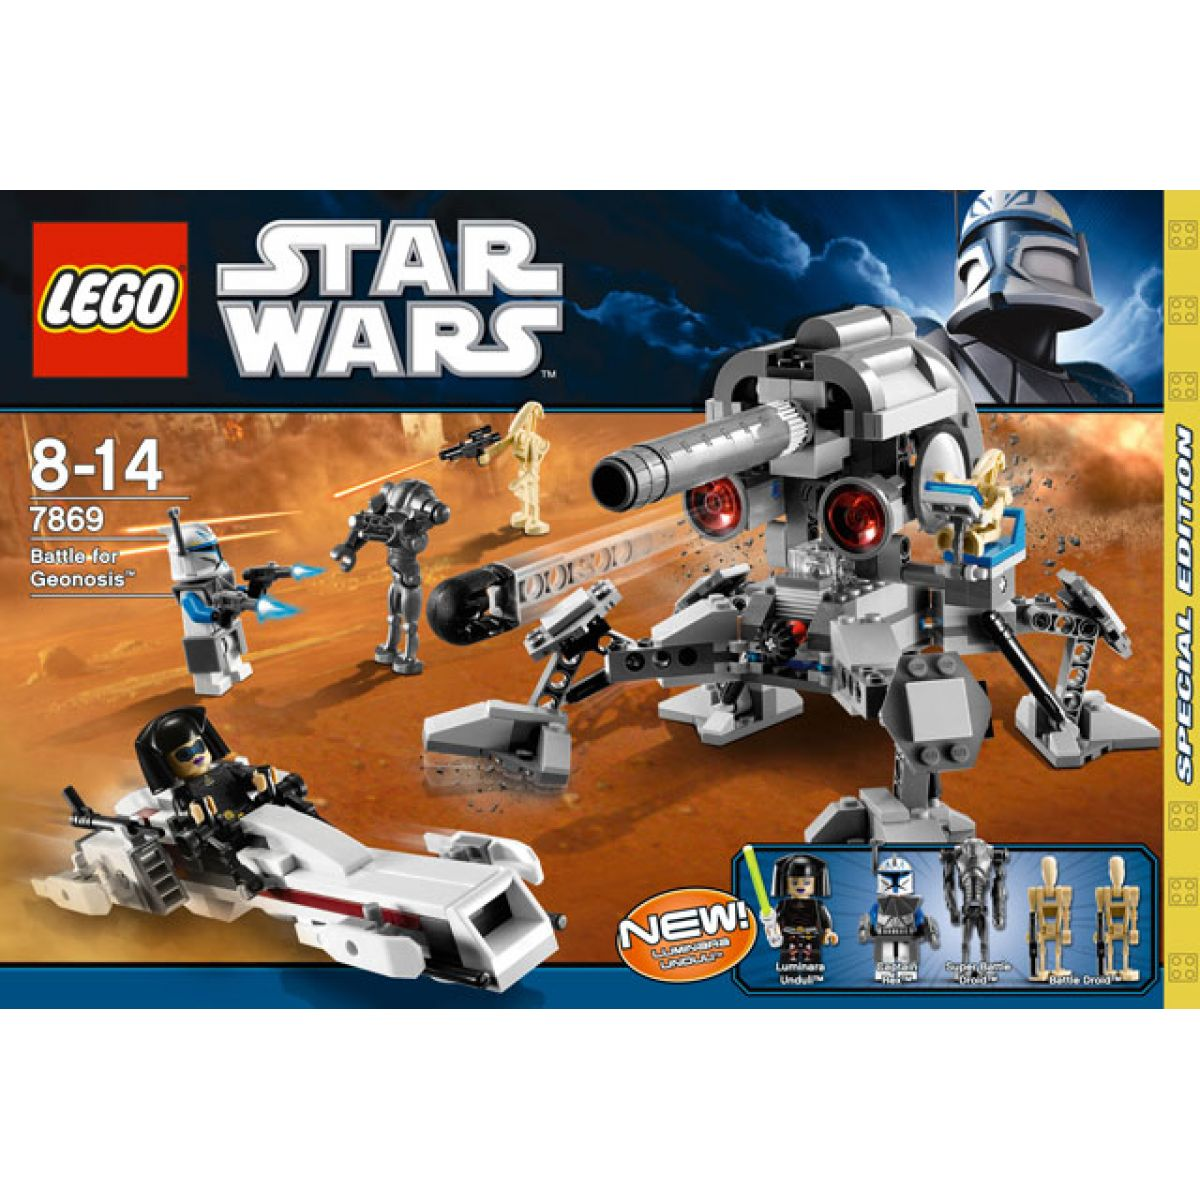 LEGO Star Wars 7869 Battle for Geonosis #1